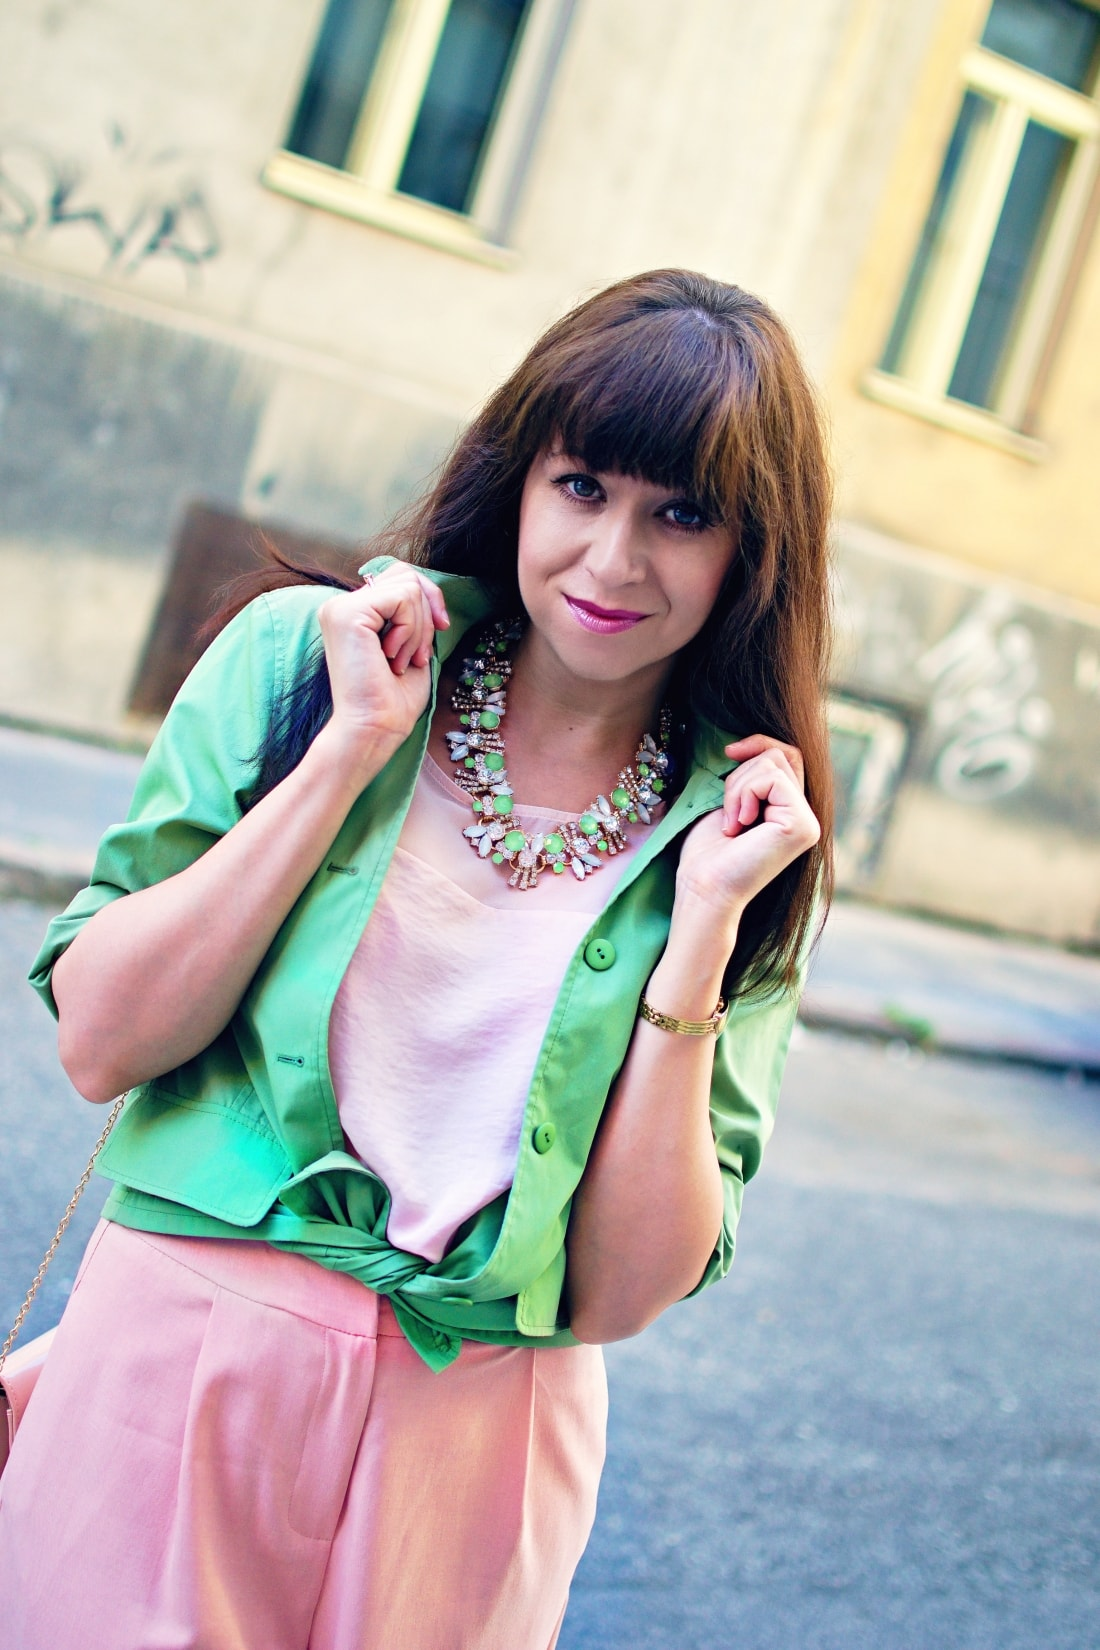 Culottes_Katharine-fashion is beautiful blog 5_Ružové nohavice_Nude lodičky_Katarína Jakubčová